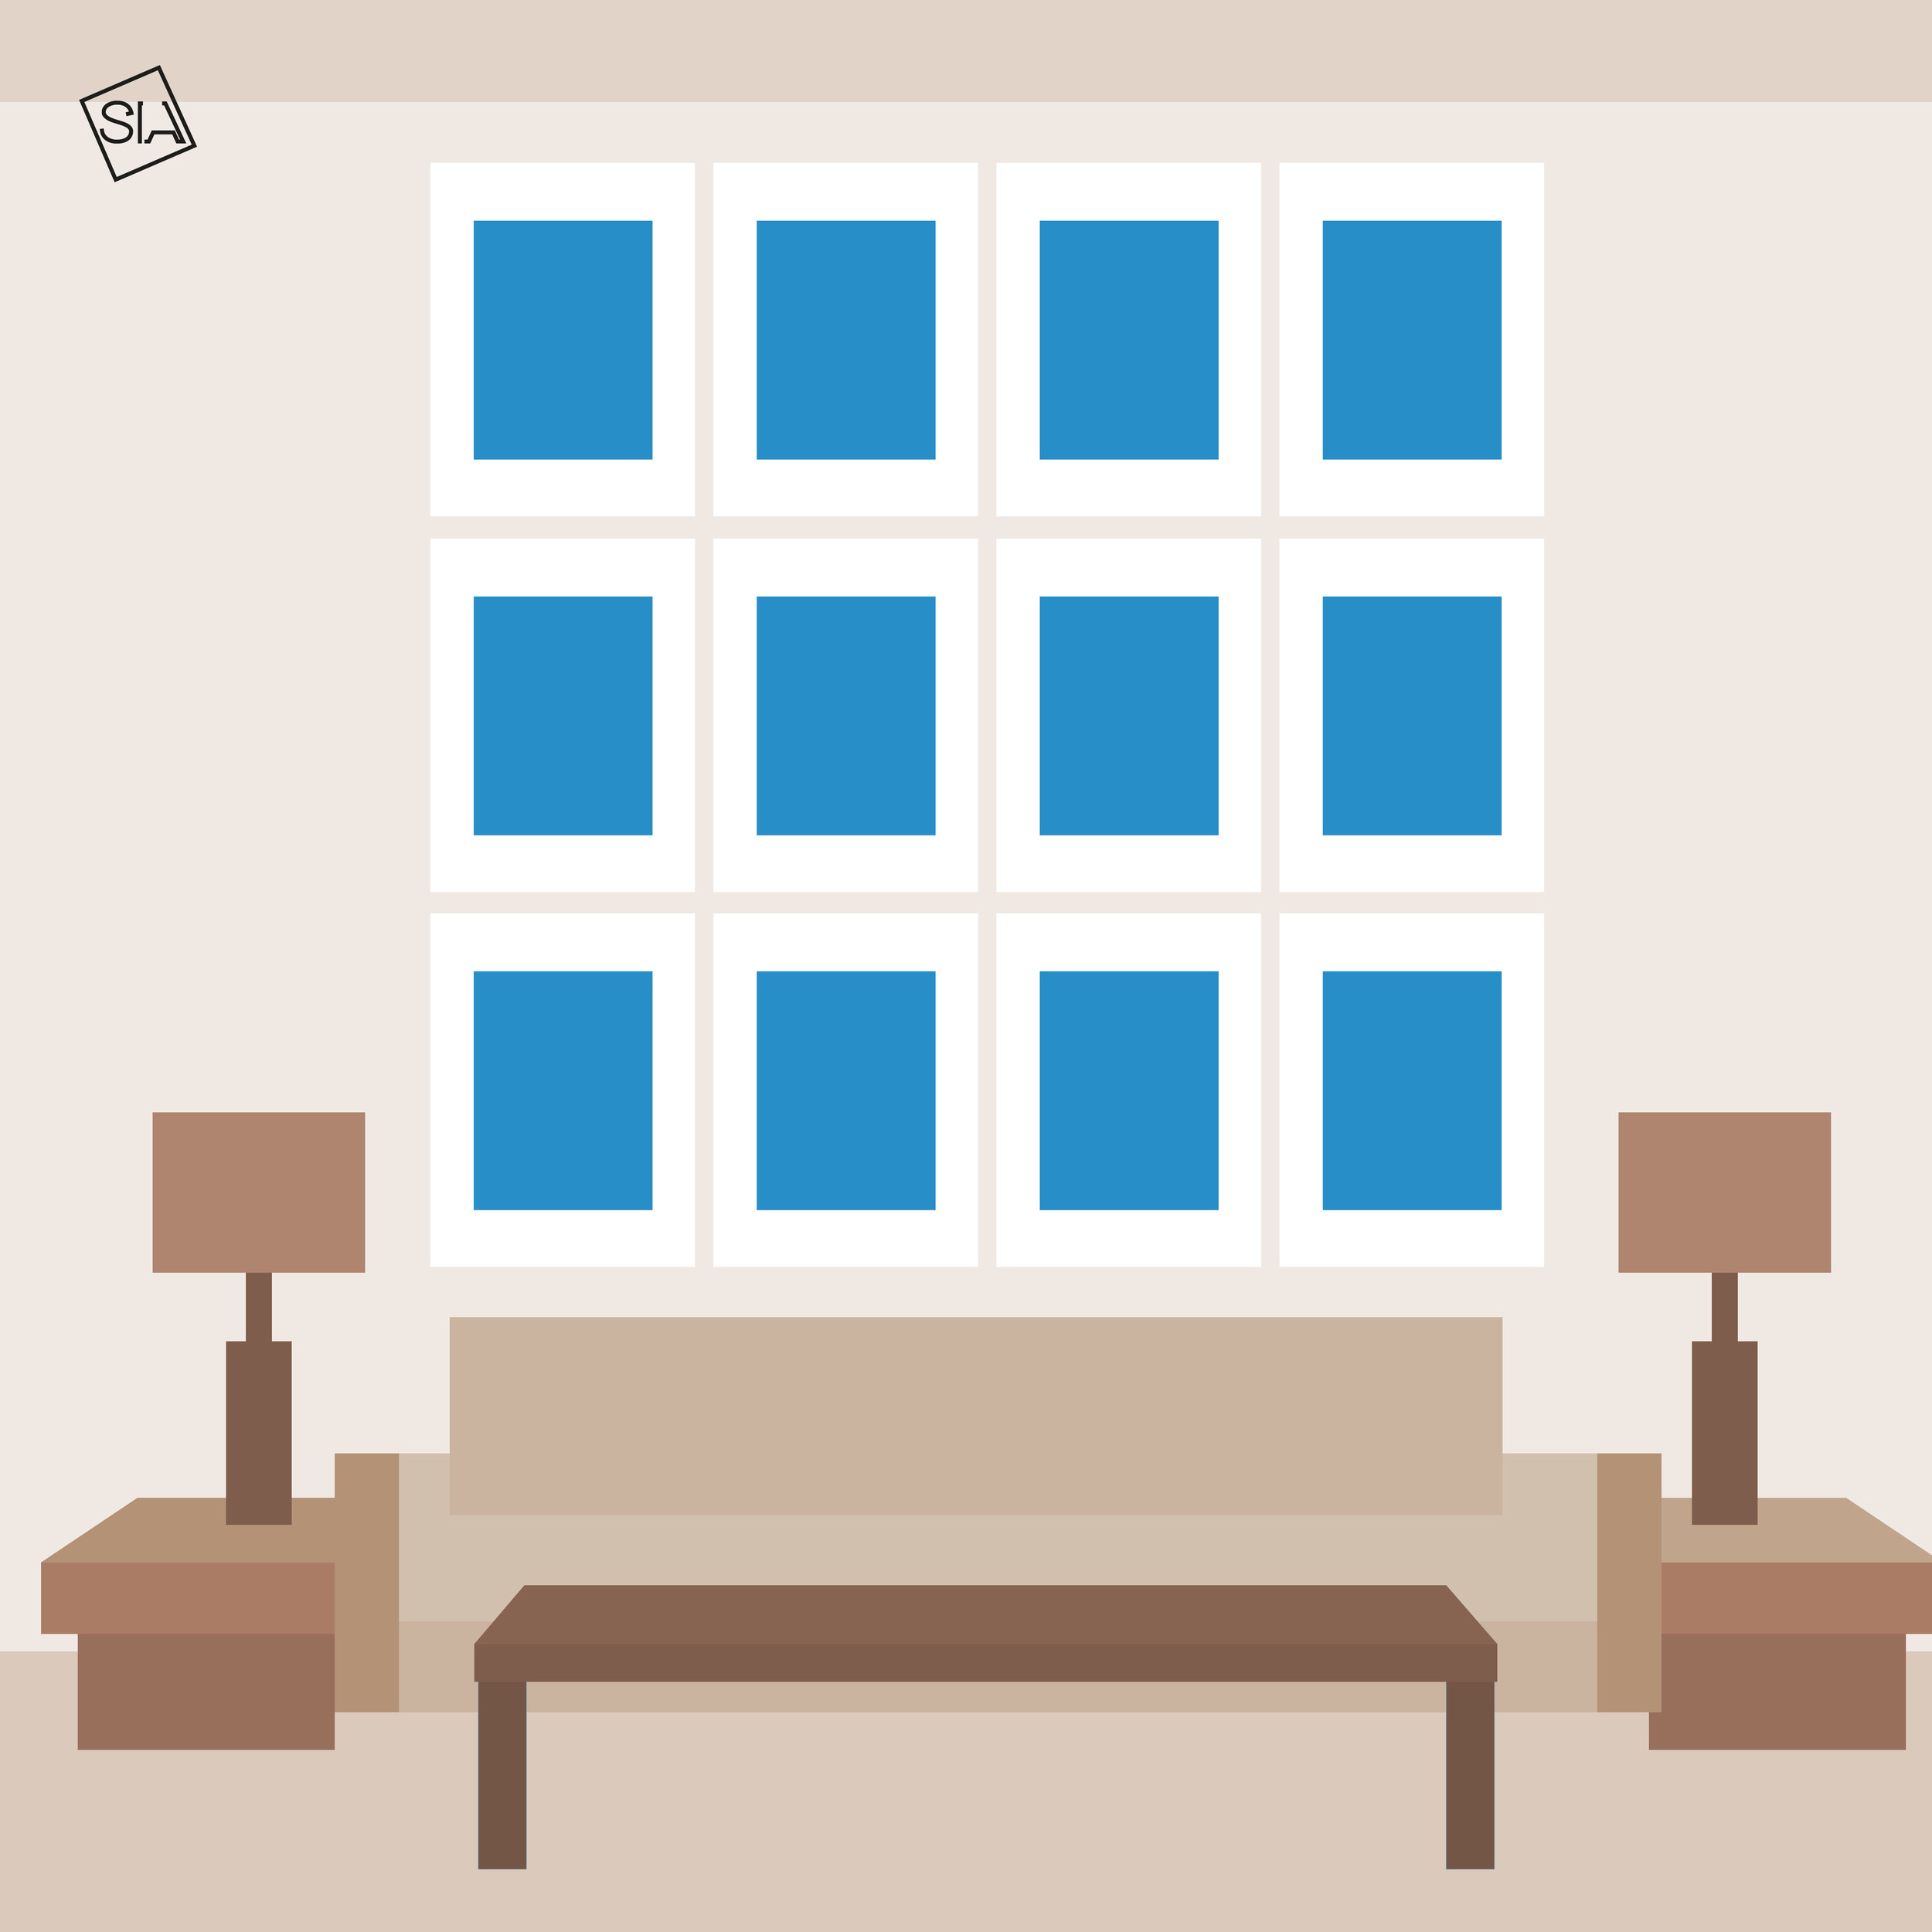 Gallery wall grid